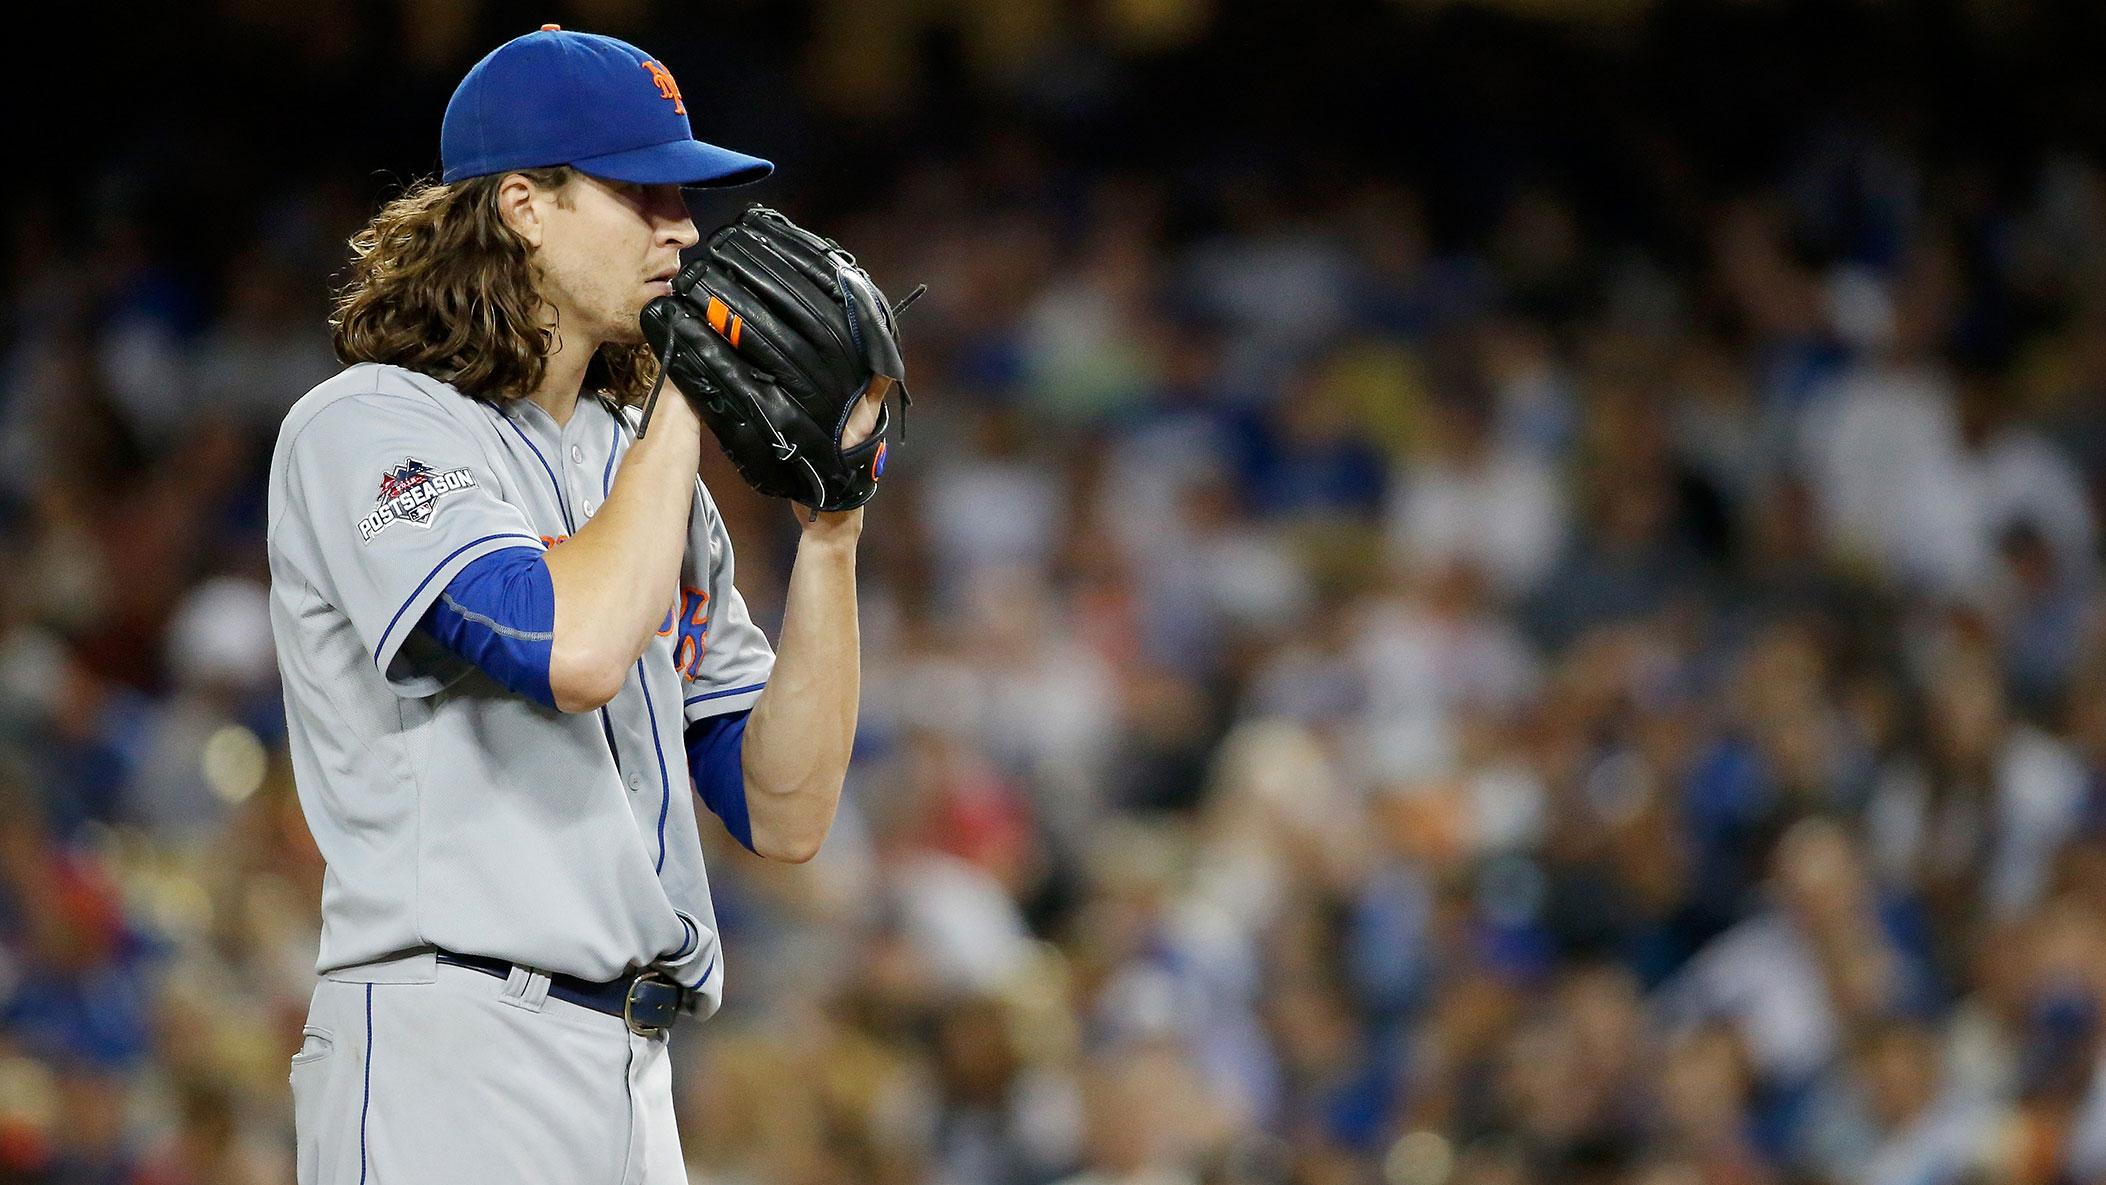 2015 NLCS Preview: Breaking Down Cubs vs. Mets